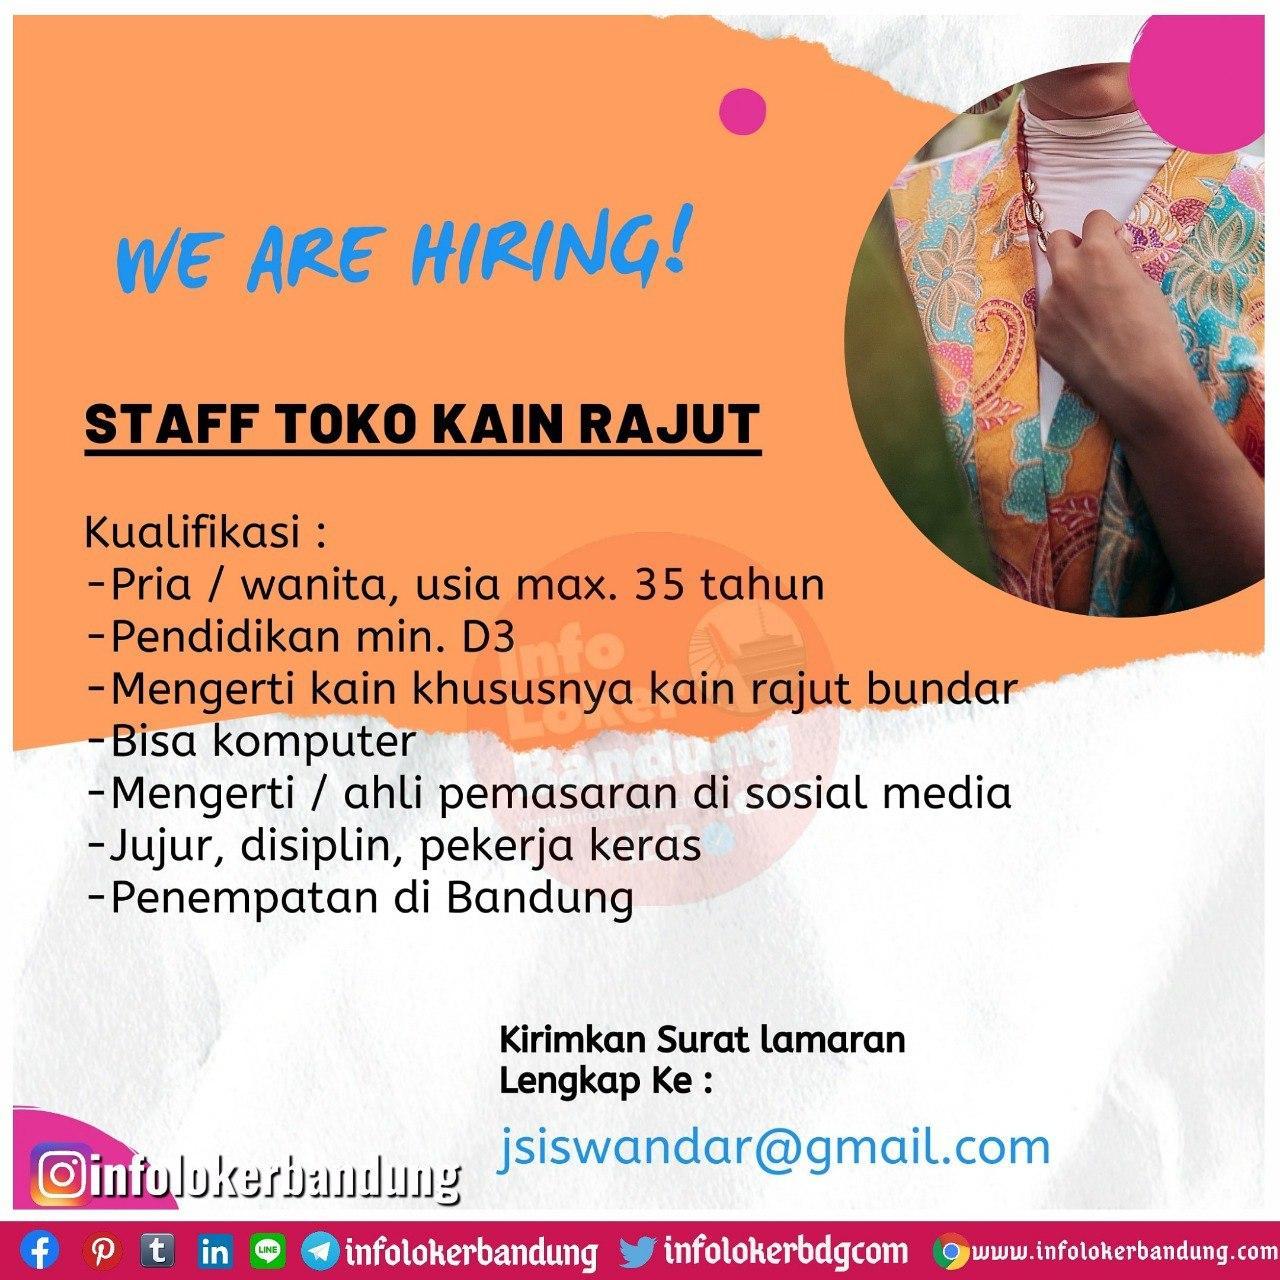 Lowongan Kerja Staff Toko Kain Rajut Bandung Juli 2020